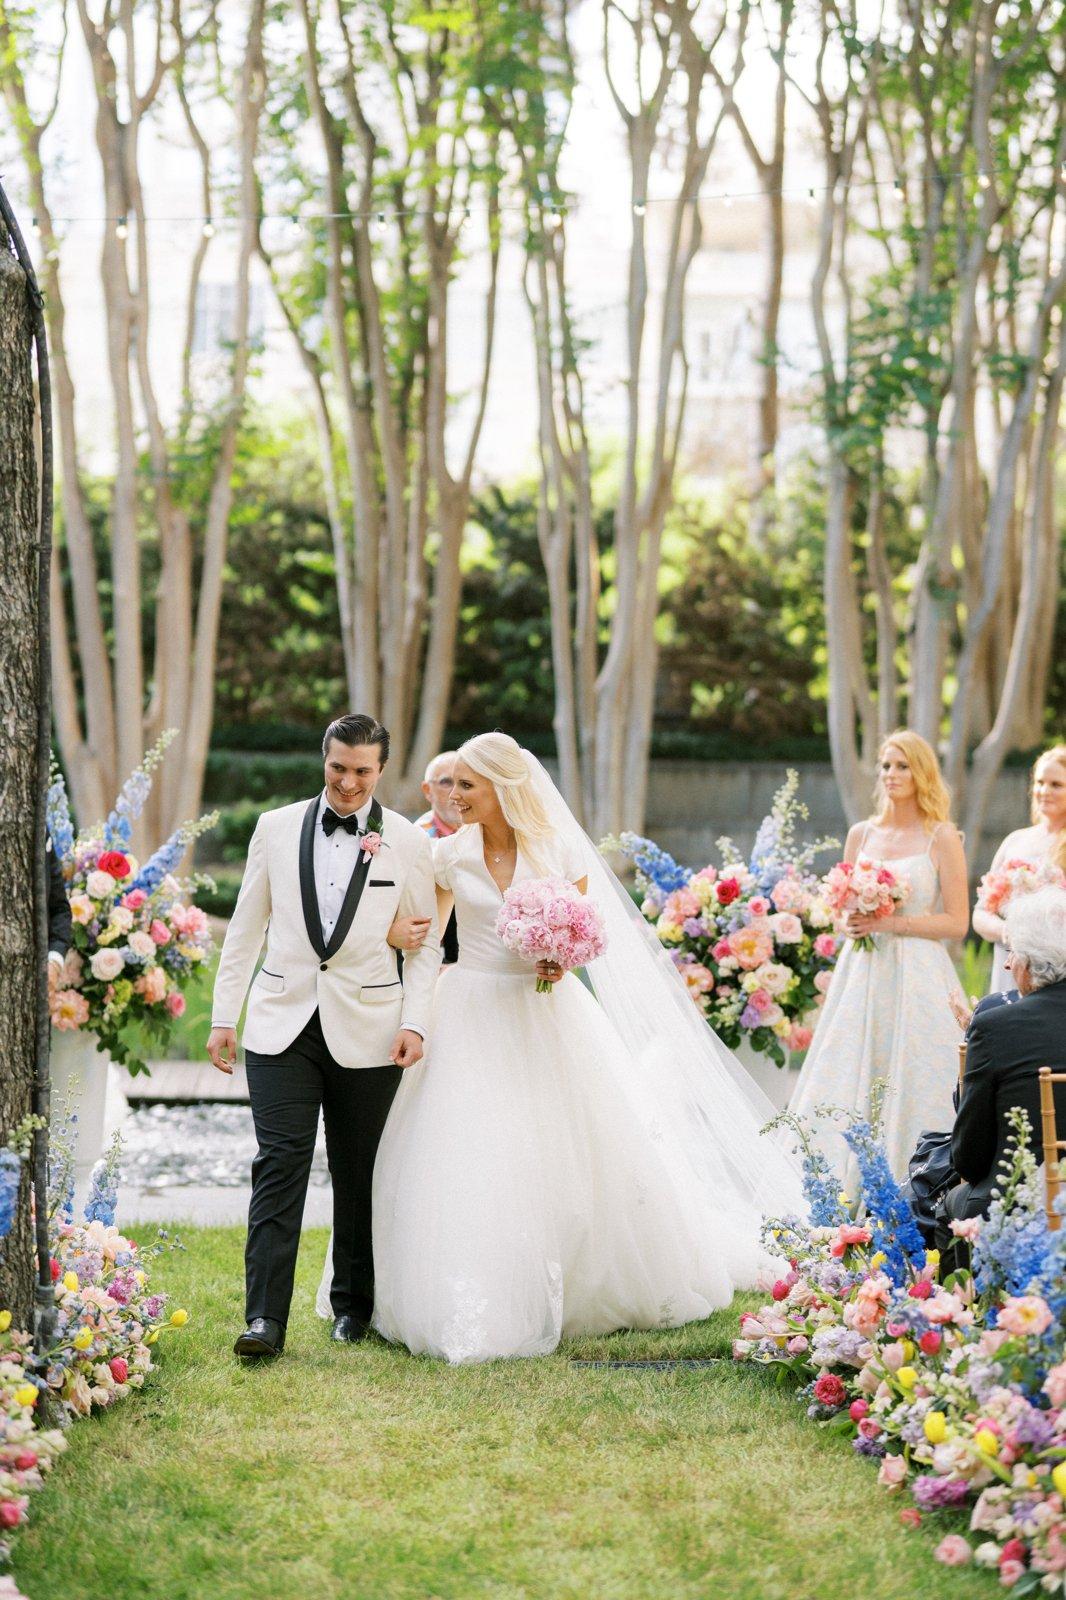 dallas_wedding_photographer_akppricing_002